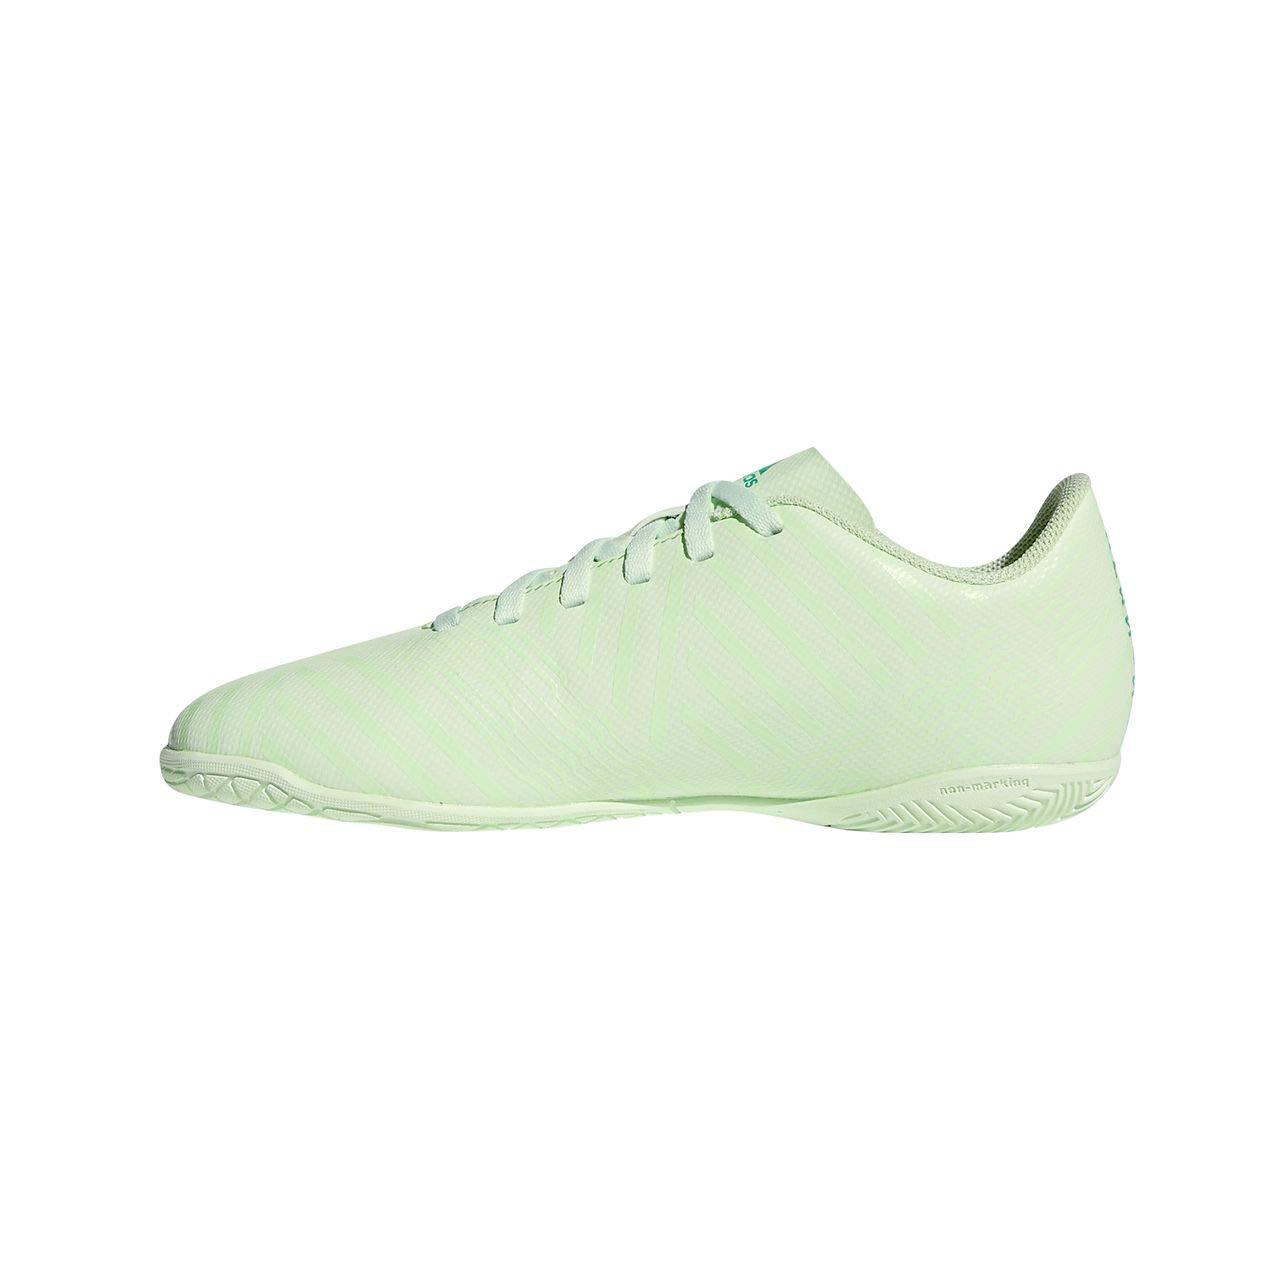 Adidas Unisex-Kinder NEMEZIZ Tango 17.4 in Jr Cp9223 Fußballschuhe